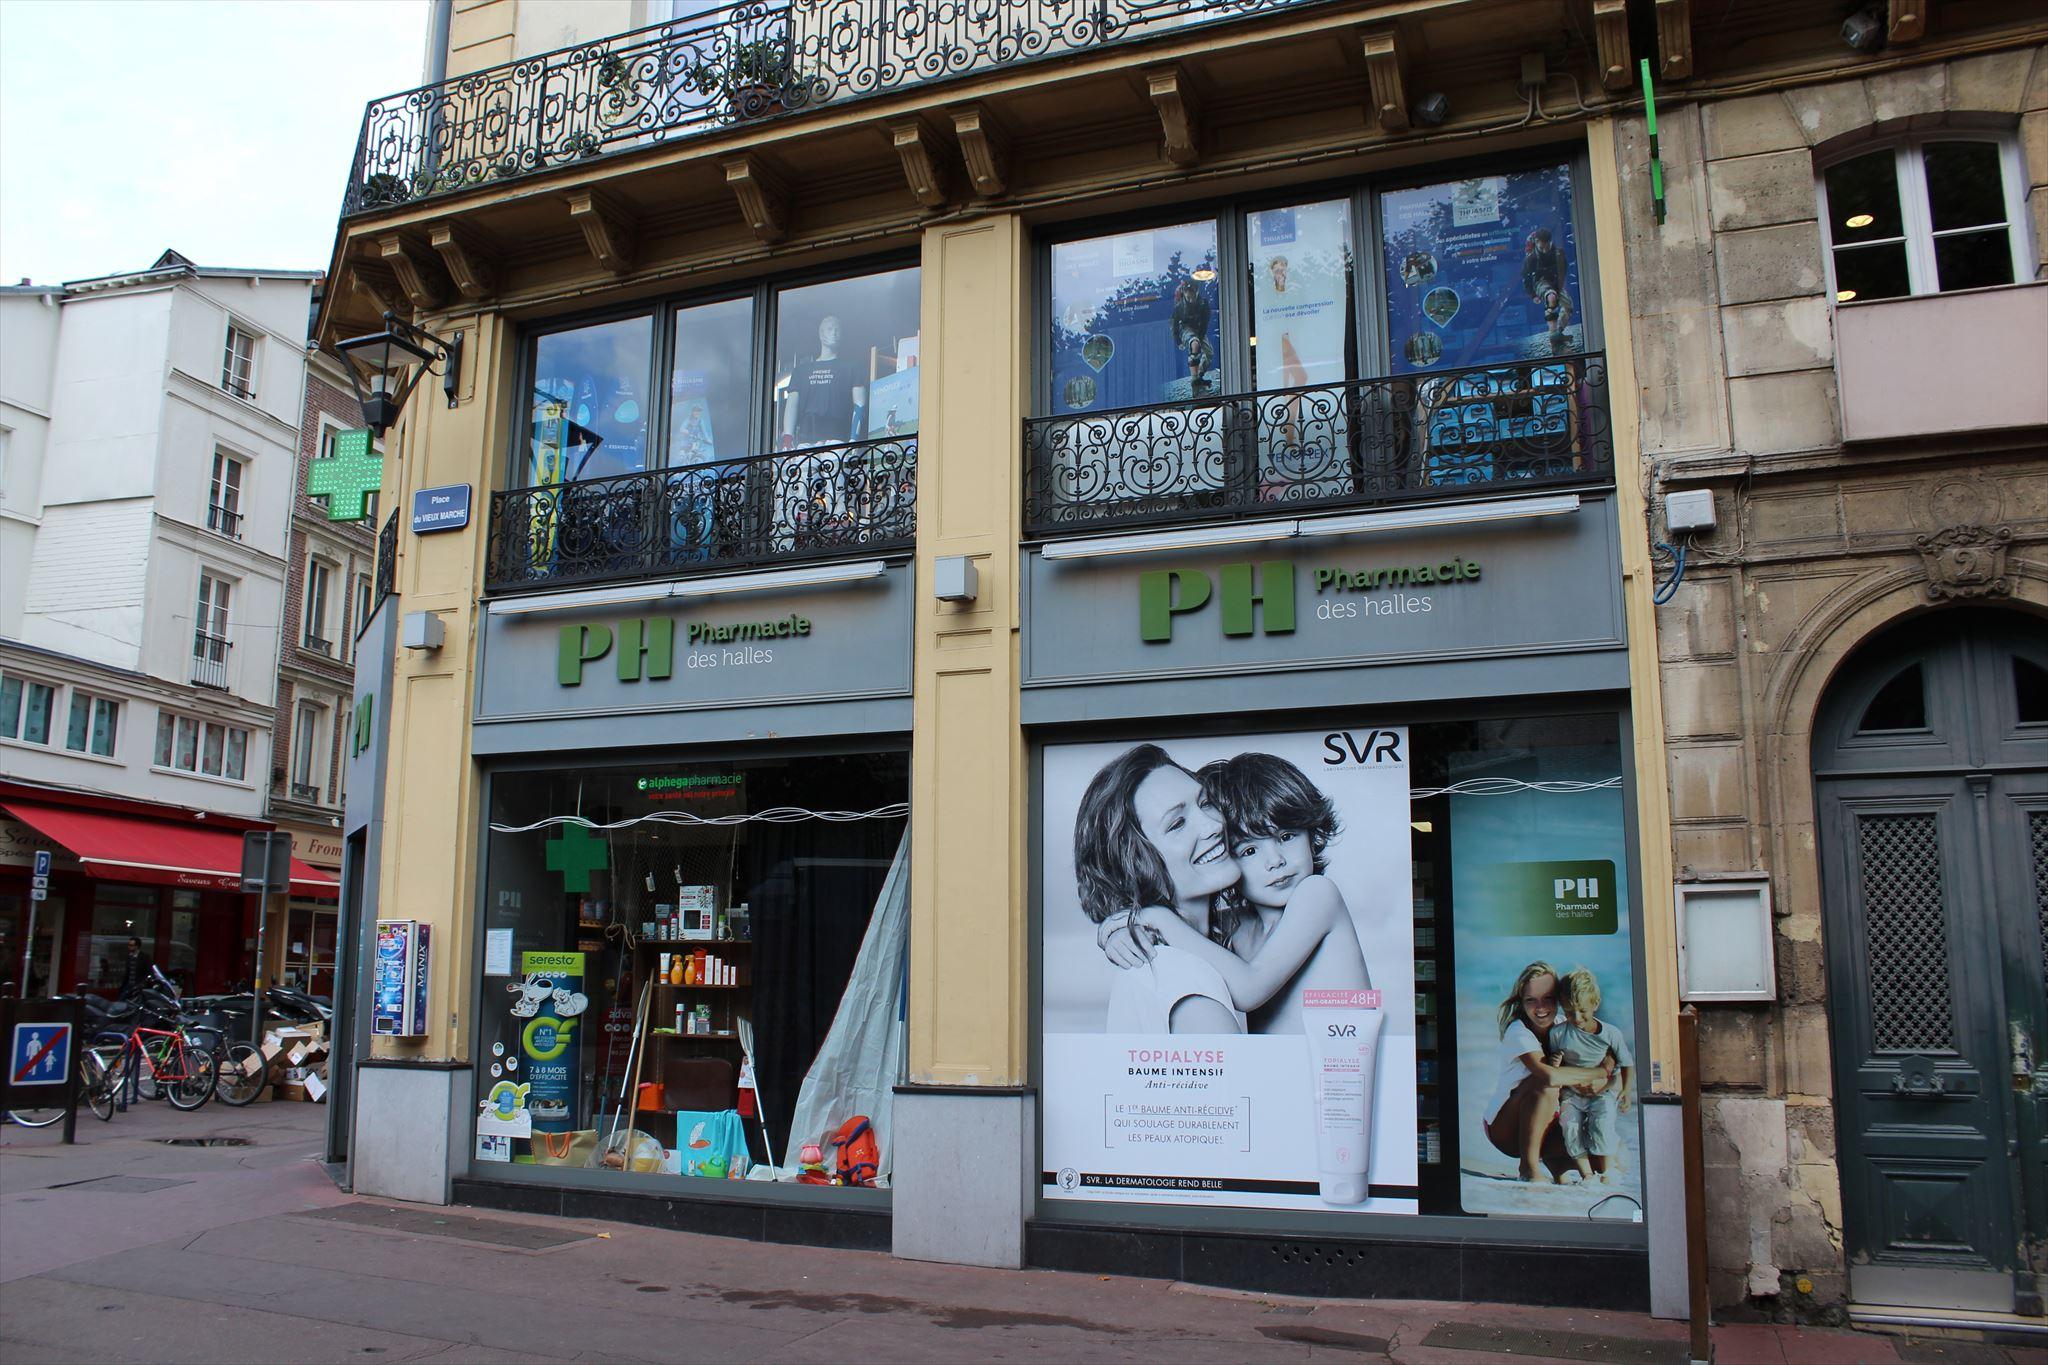 Pharmacie des halles rouen france independent for Pharmacie de la piscine